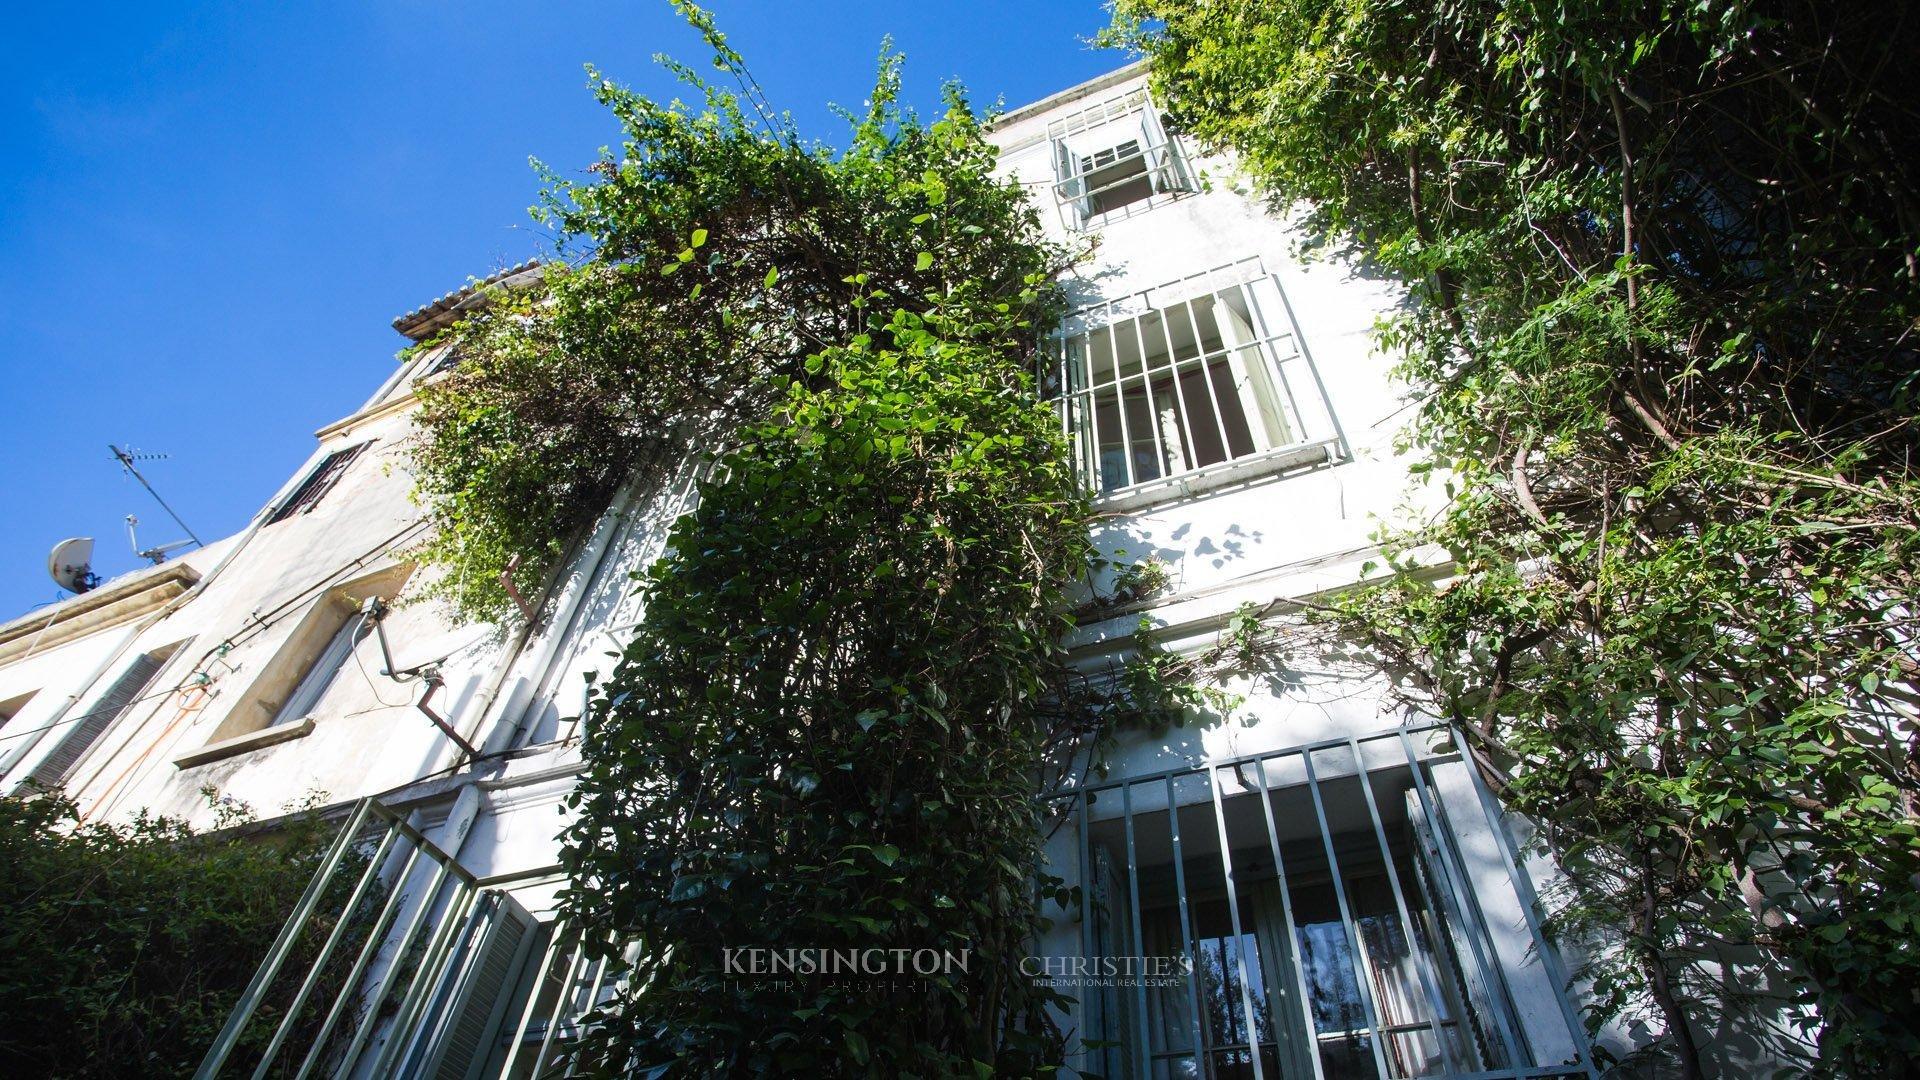 KPPM01122: Villa Ekat Luxury Villa Tanger Morocco